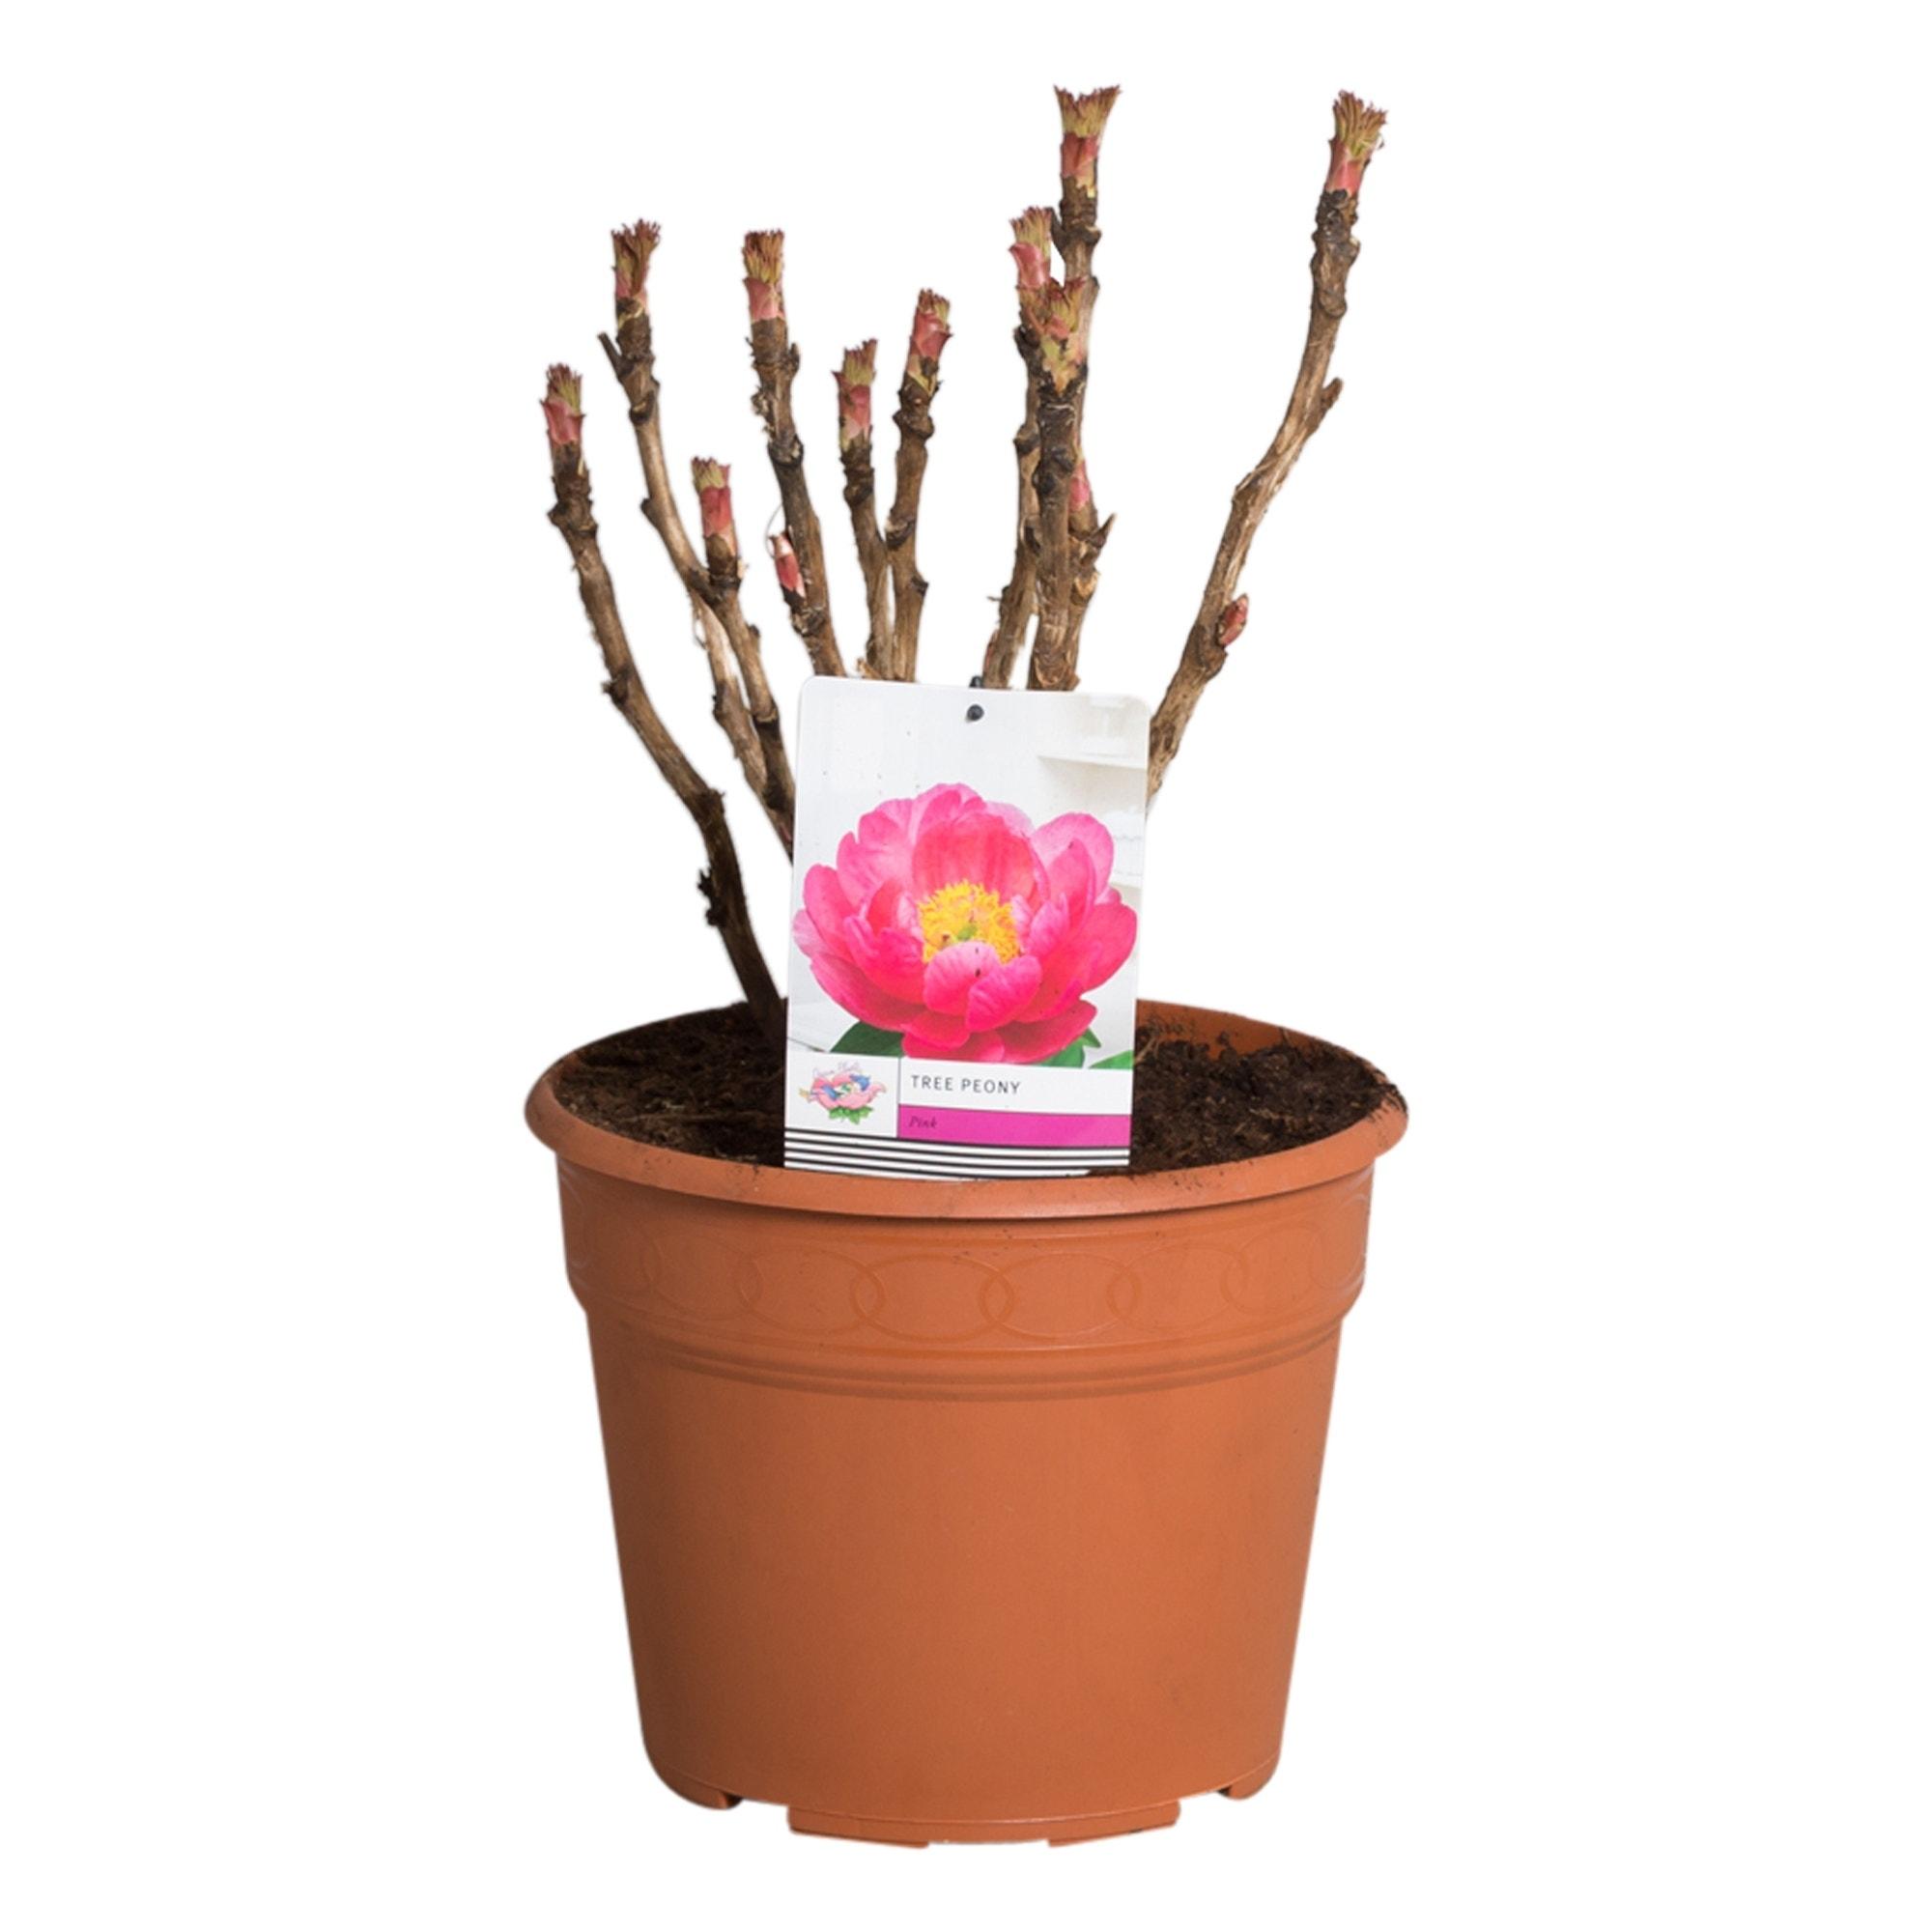 Roze Boompioen (Paeonia suffruticosa)-Plant in pot-p11. Kleur: roze